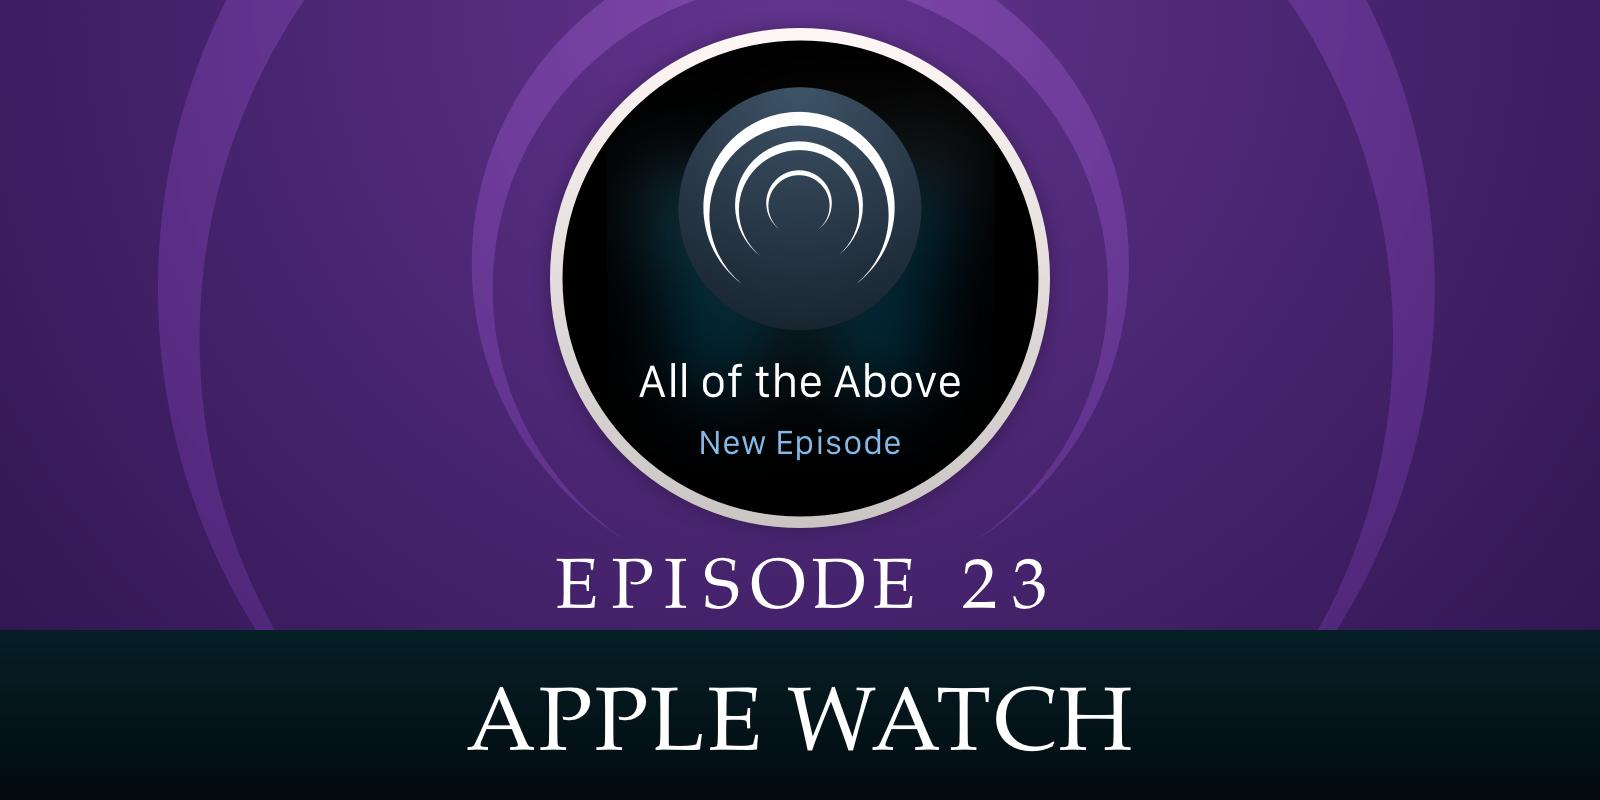 Episode 23: Apple Watch